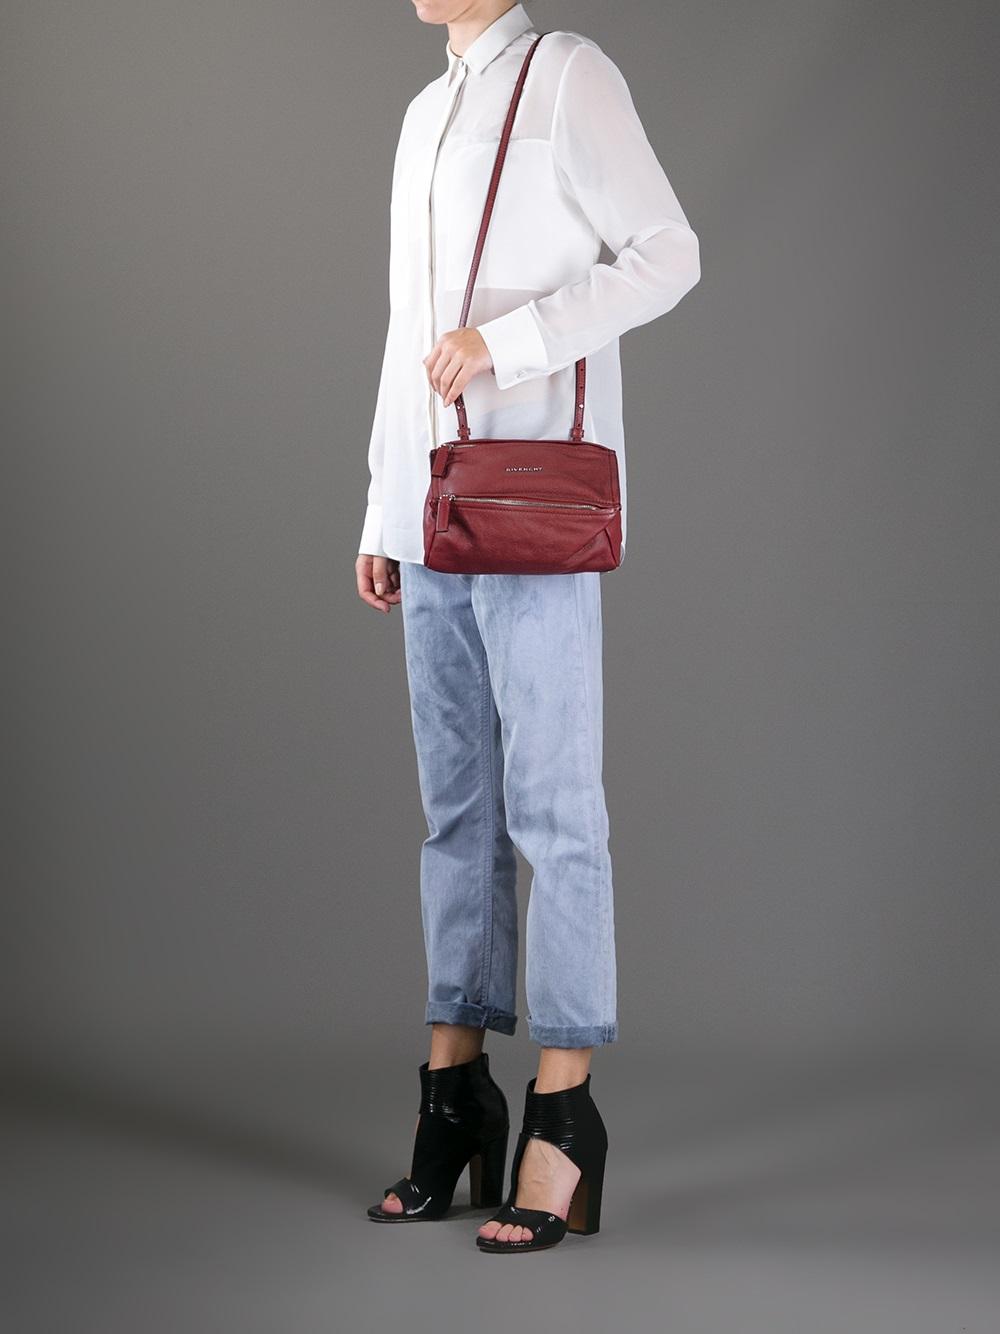 Lyst - Givenchy Mini Pandora Shoulder Bag in Purple 3425677fef44d